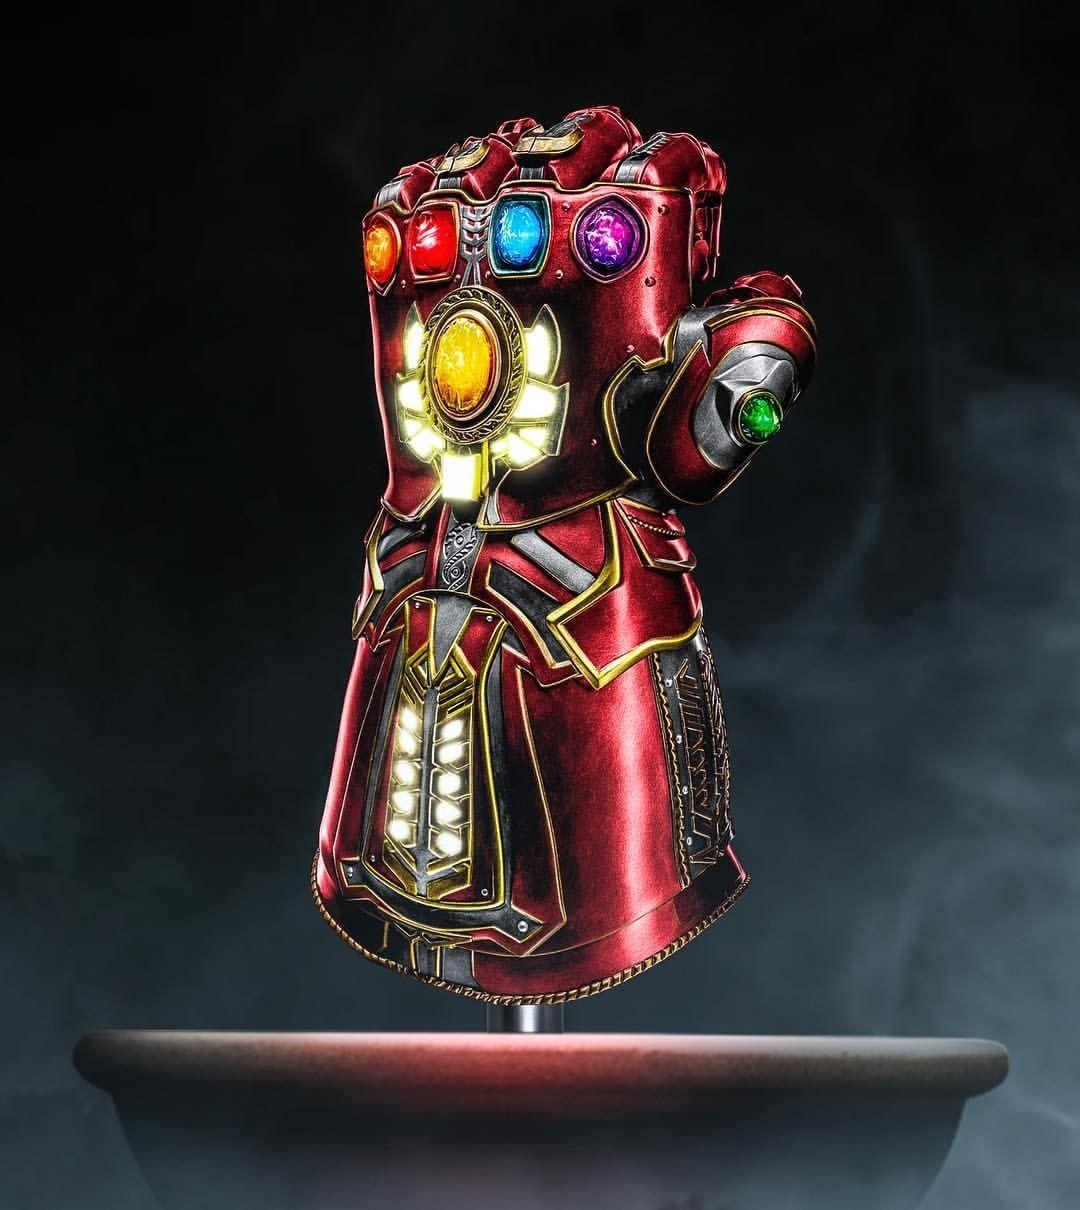 Pin By Ari Nava On Avengers Marvel Superheroes Marvel Infinity Marvel Artwork